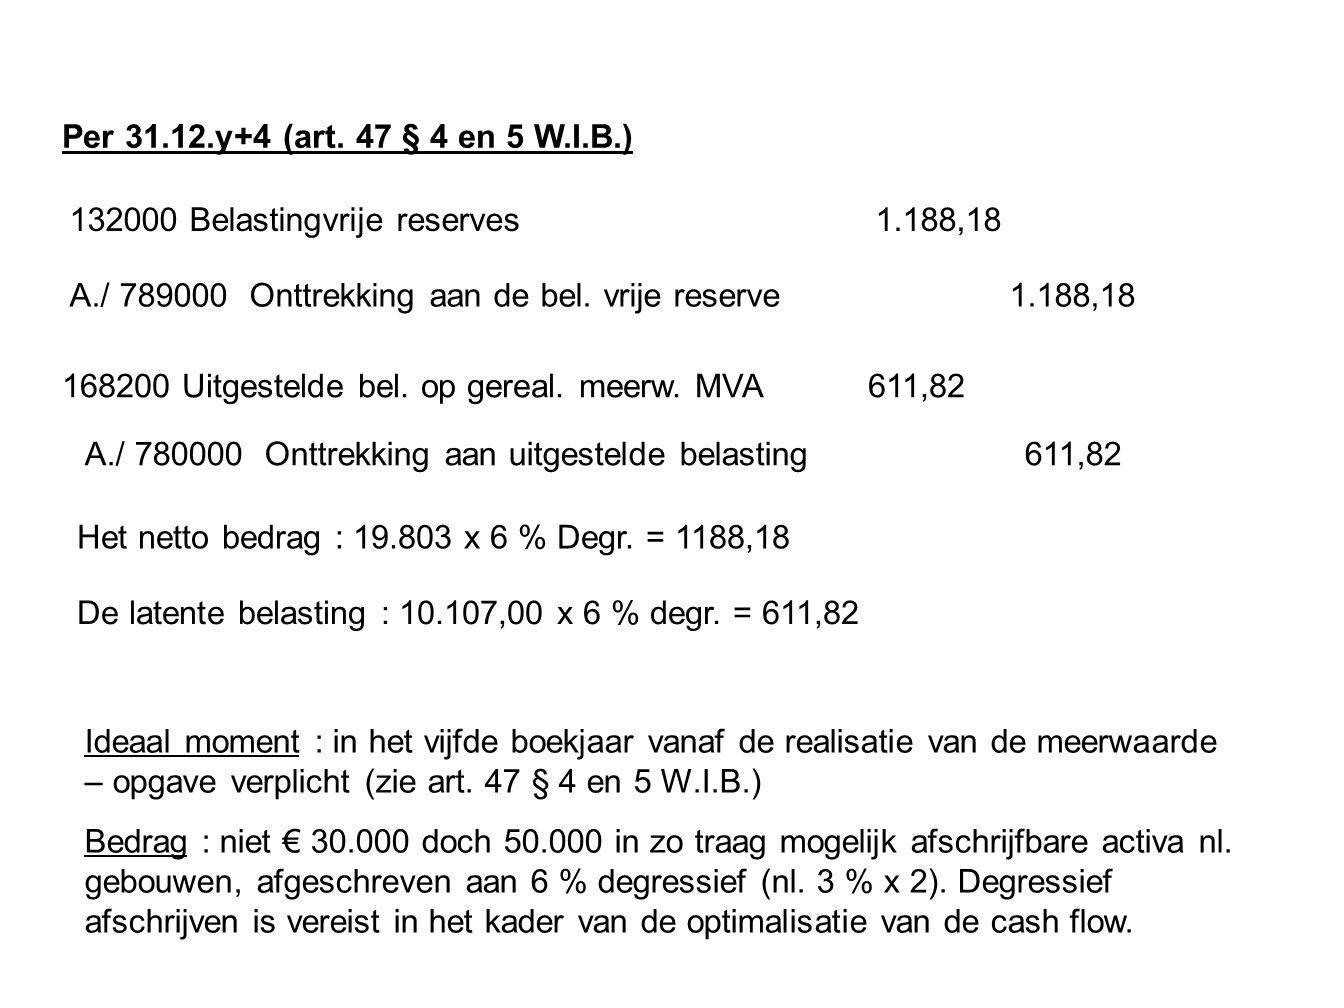 Per 31.12.y+4 (art. 47 § 4 en 5 W.I.B.) 132000 Belastingvrije reserves 1.188,18.